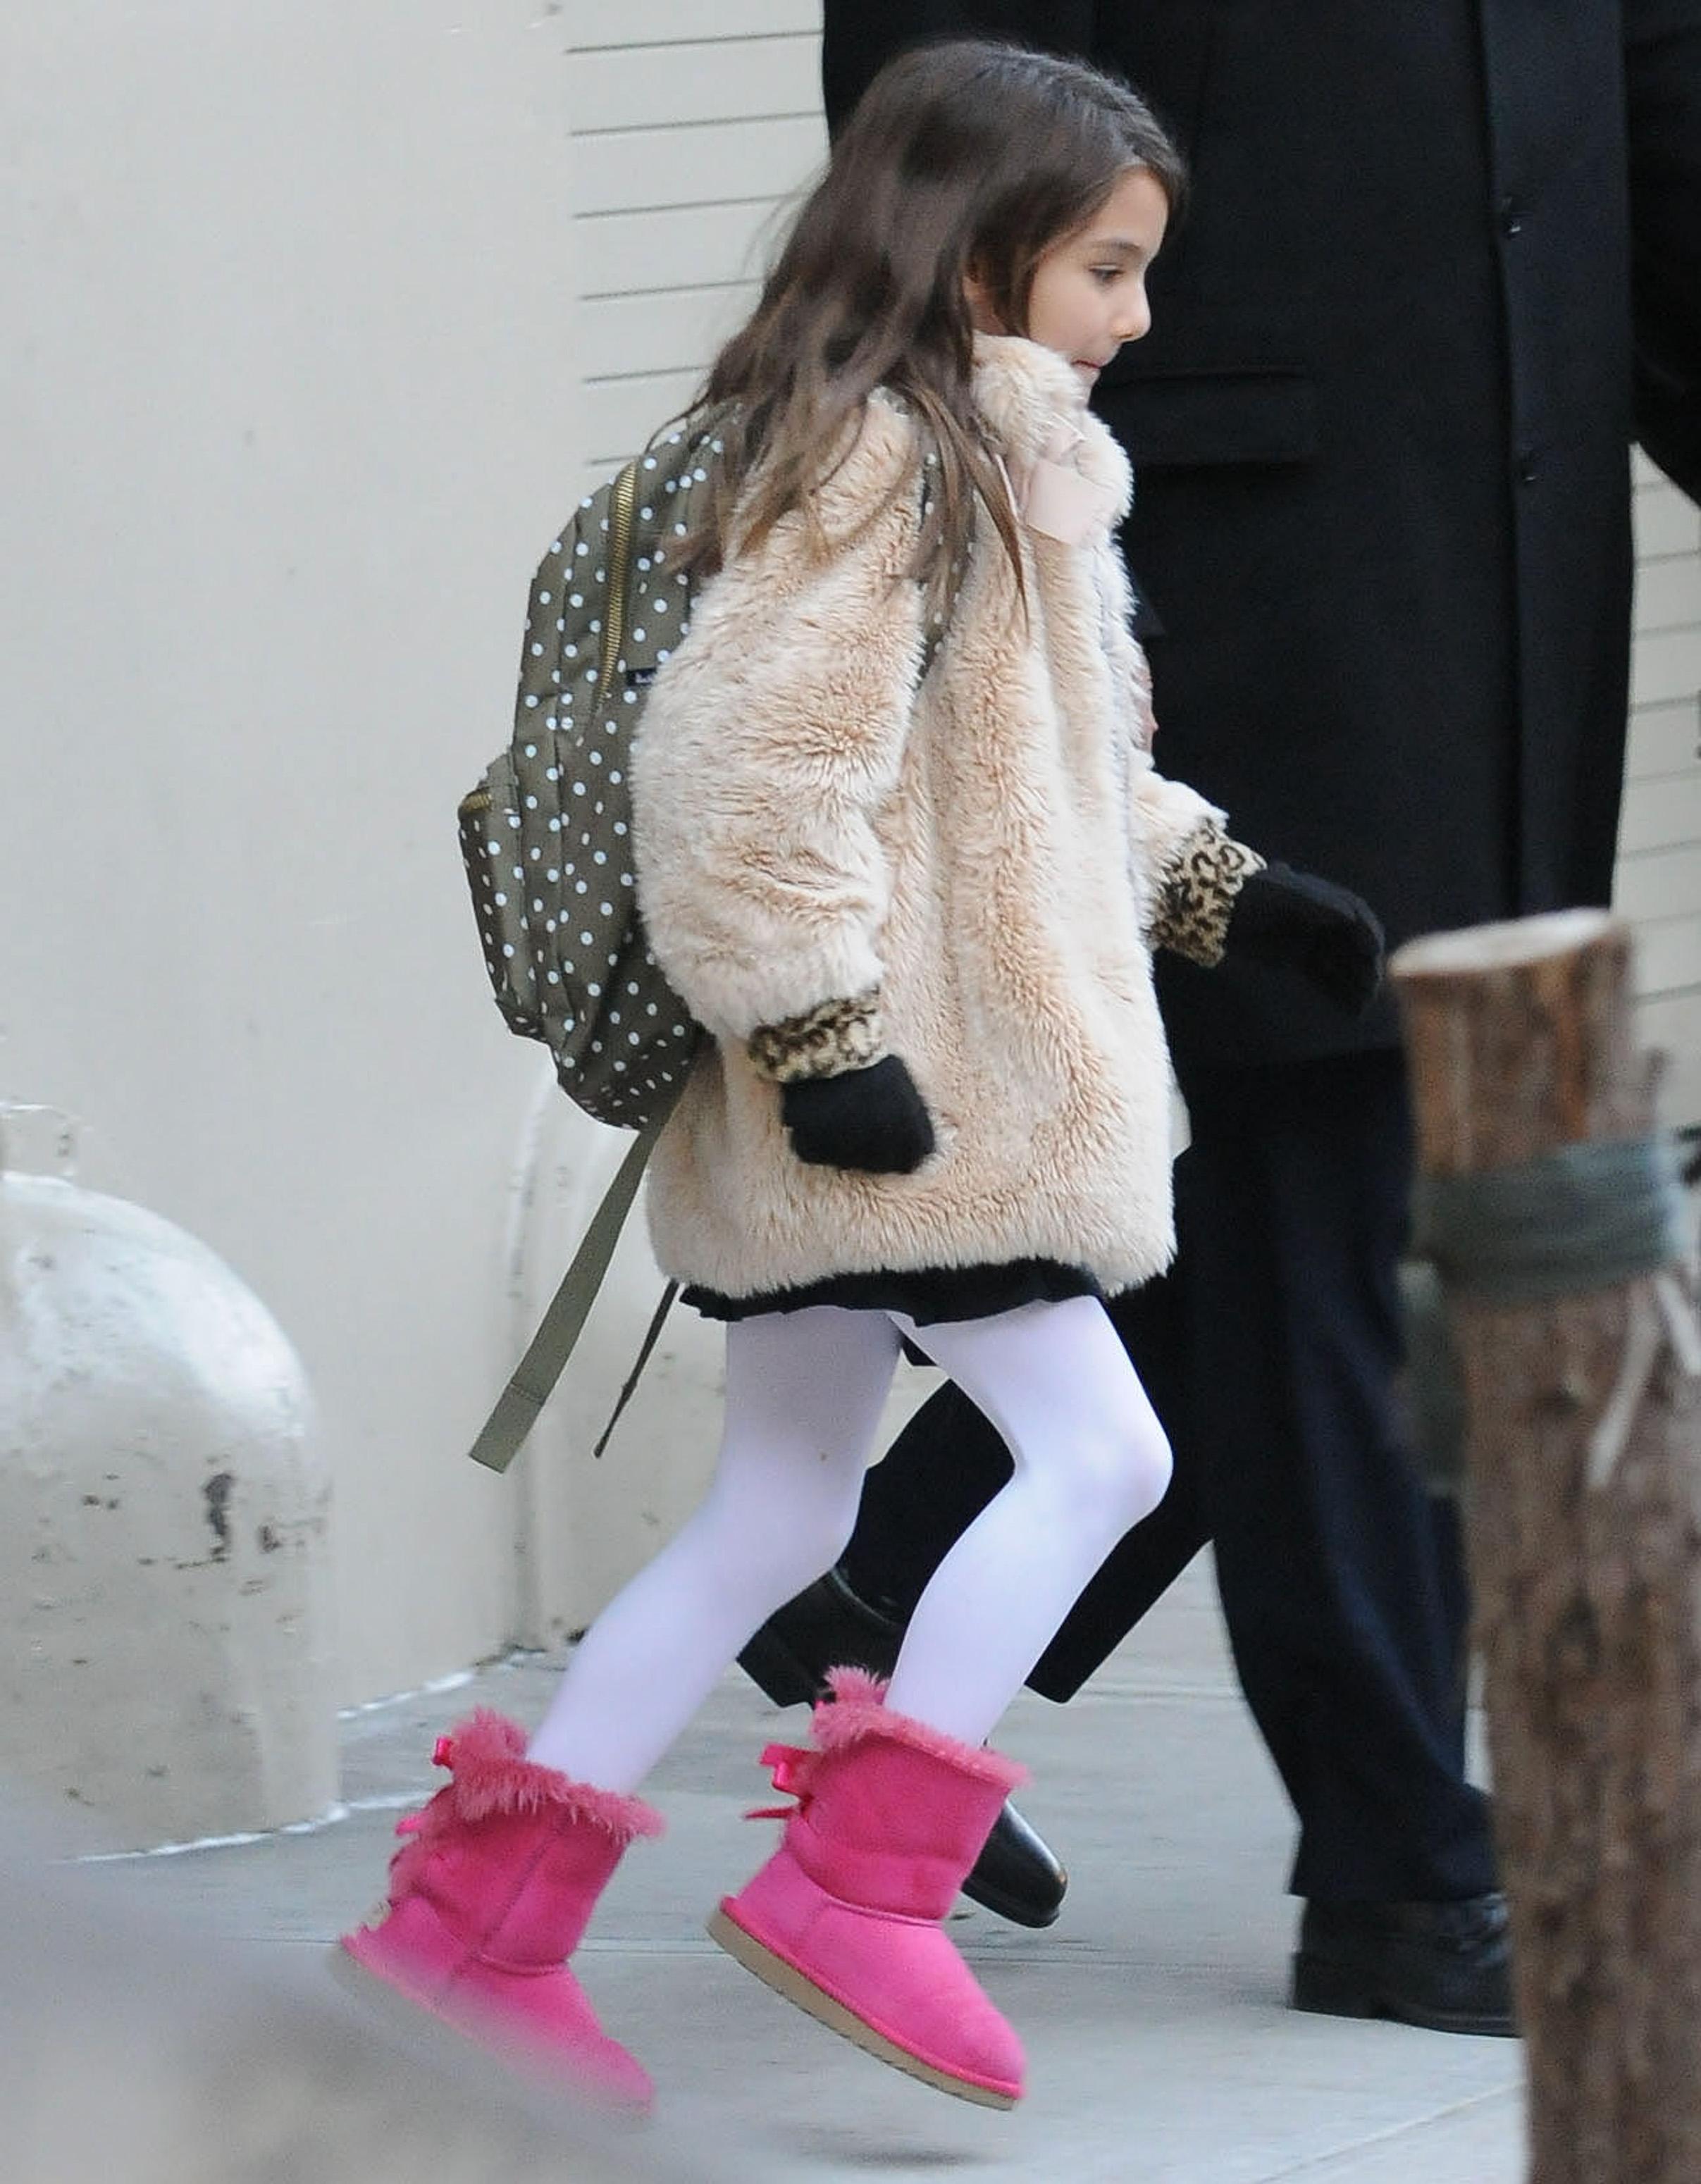 Celebrity Sightings In New York - December 14, 2013